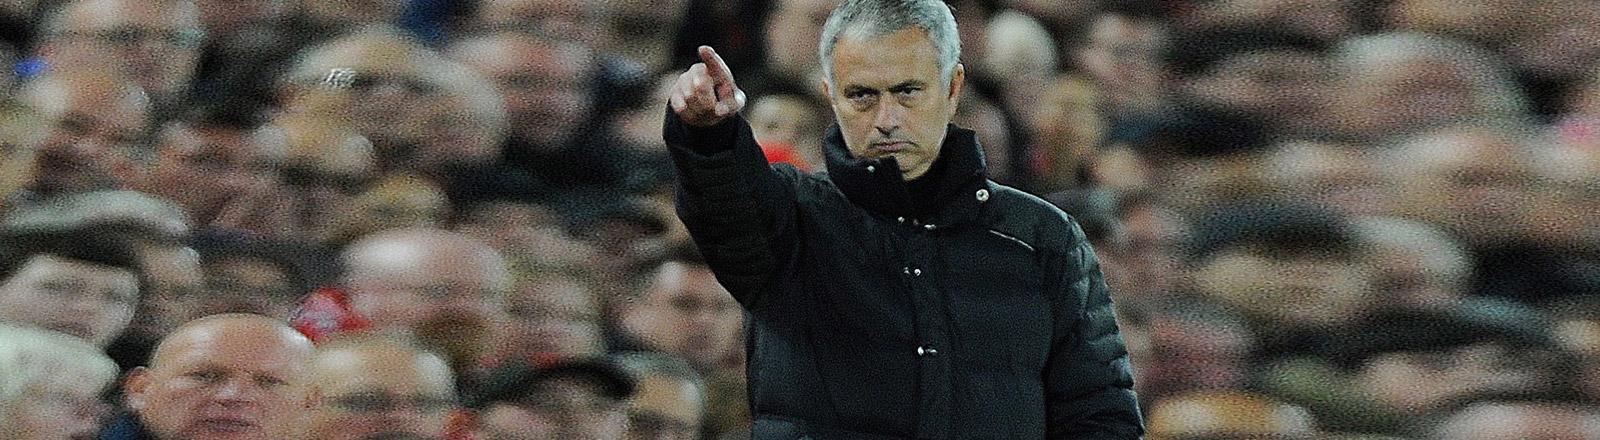 Fußballtrainer Jose Mourinho